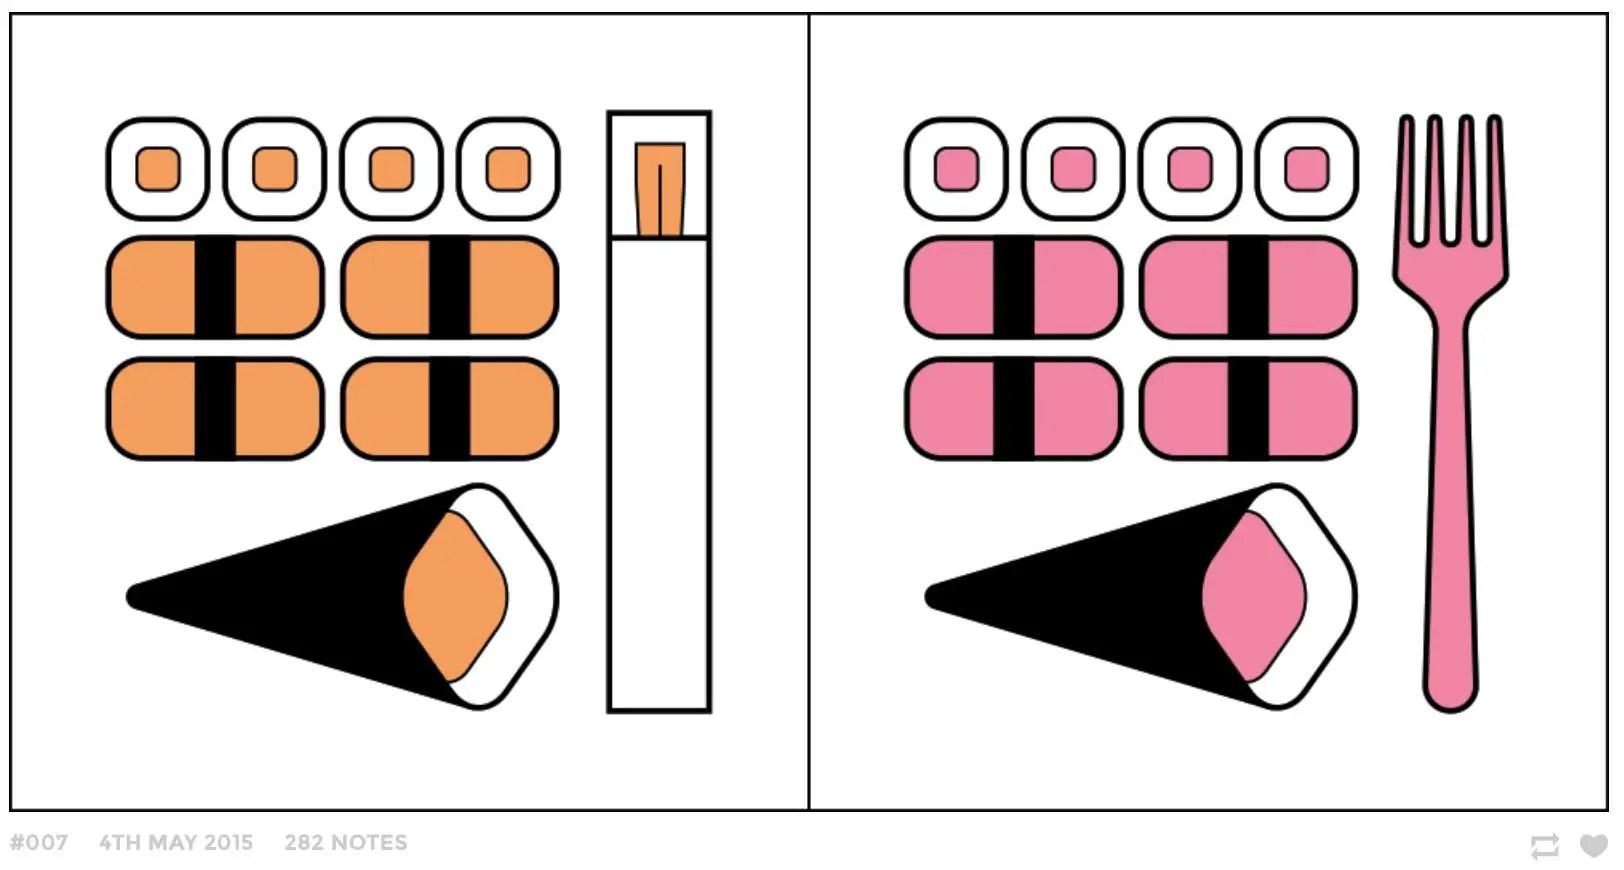 wersm-2kindsofpeople-tumblr-sushi